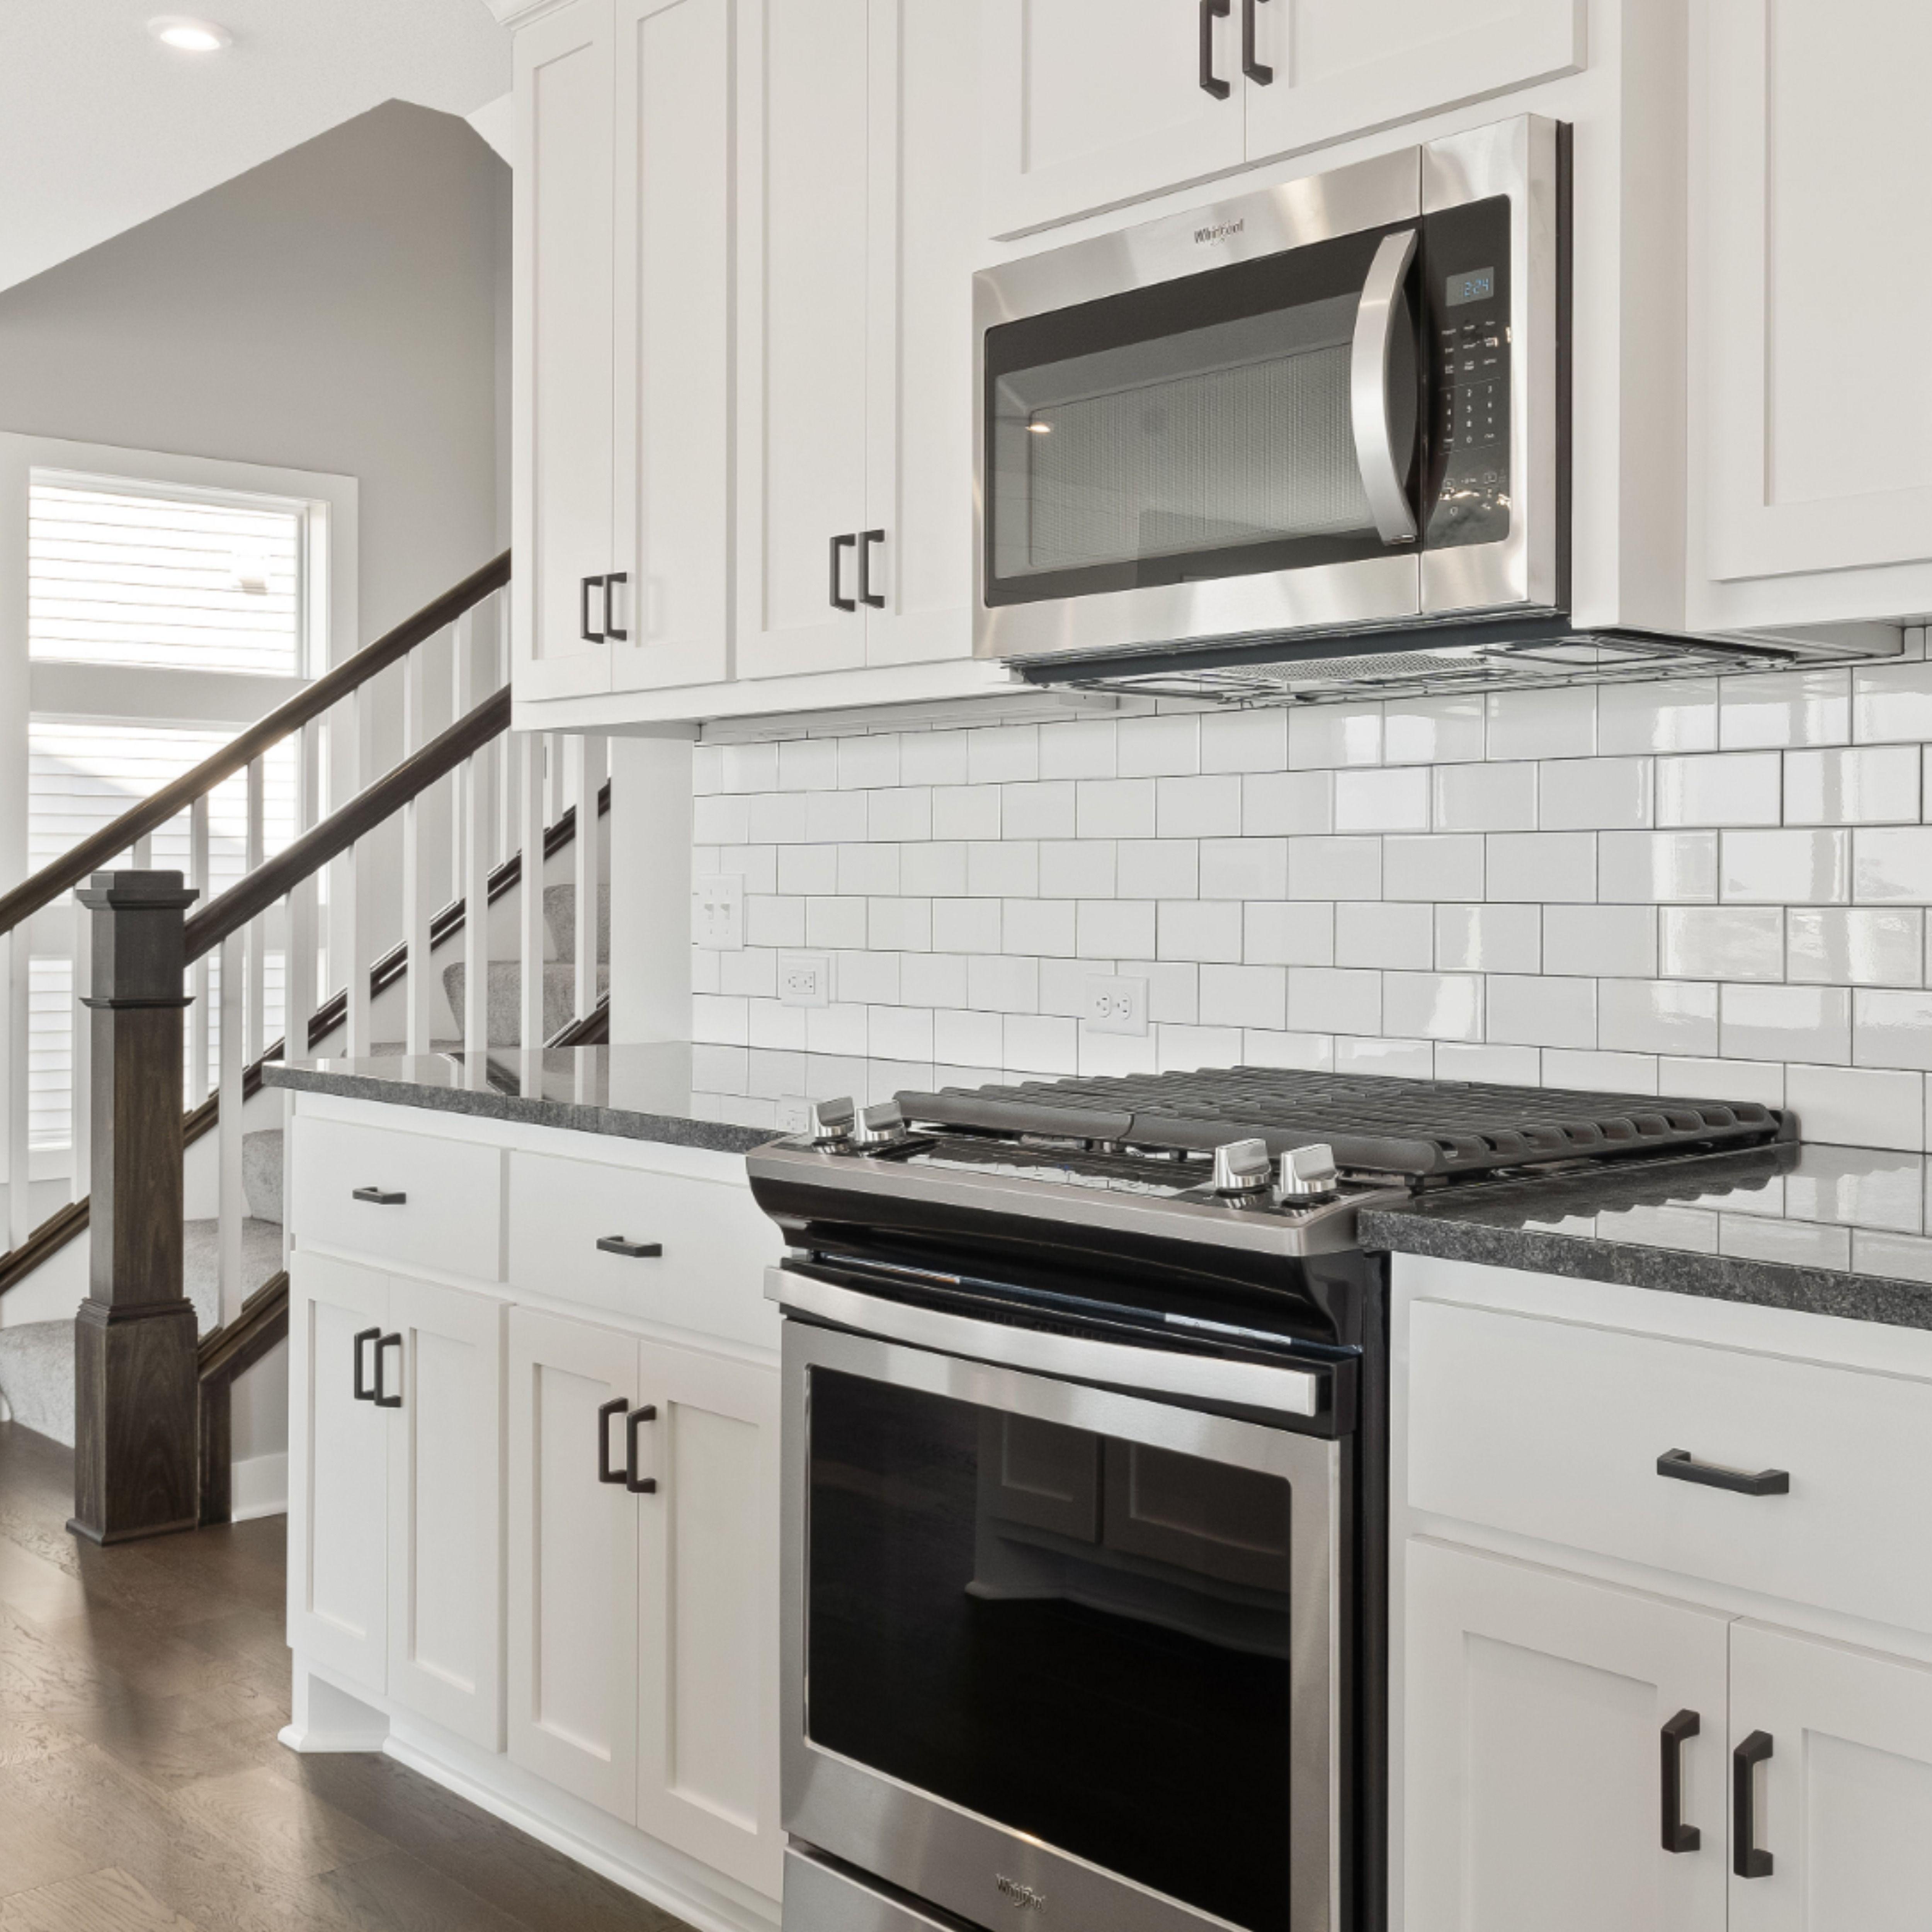 Hanson Builders Newport Kitchen Matte Black Kitchen Hardware Black Granite Kitchen White Cabinets Black Granite Kitchen backsplash white cabinets black countertop